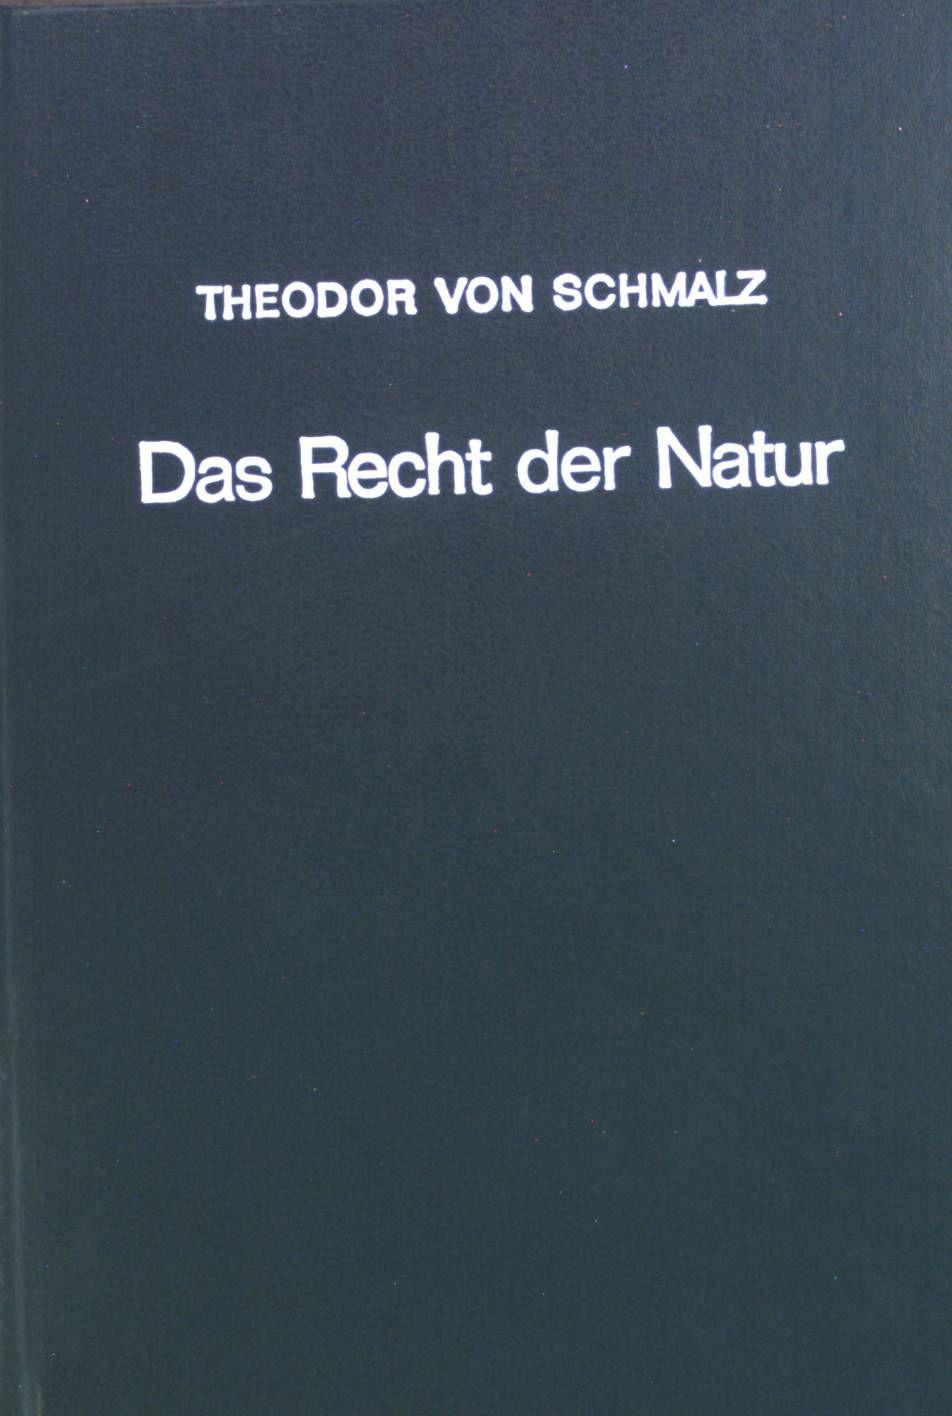 Das Recht der Natur